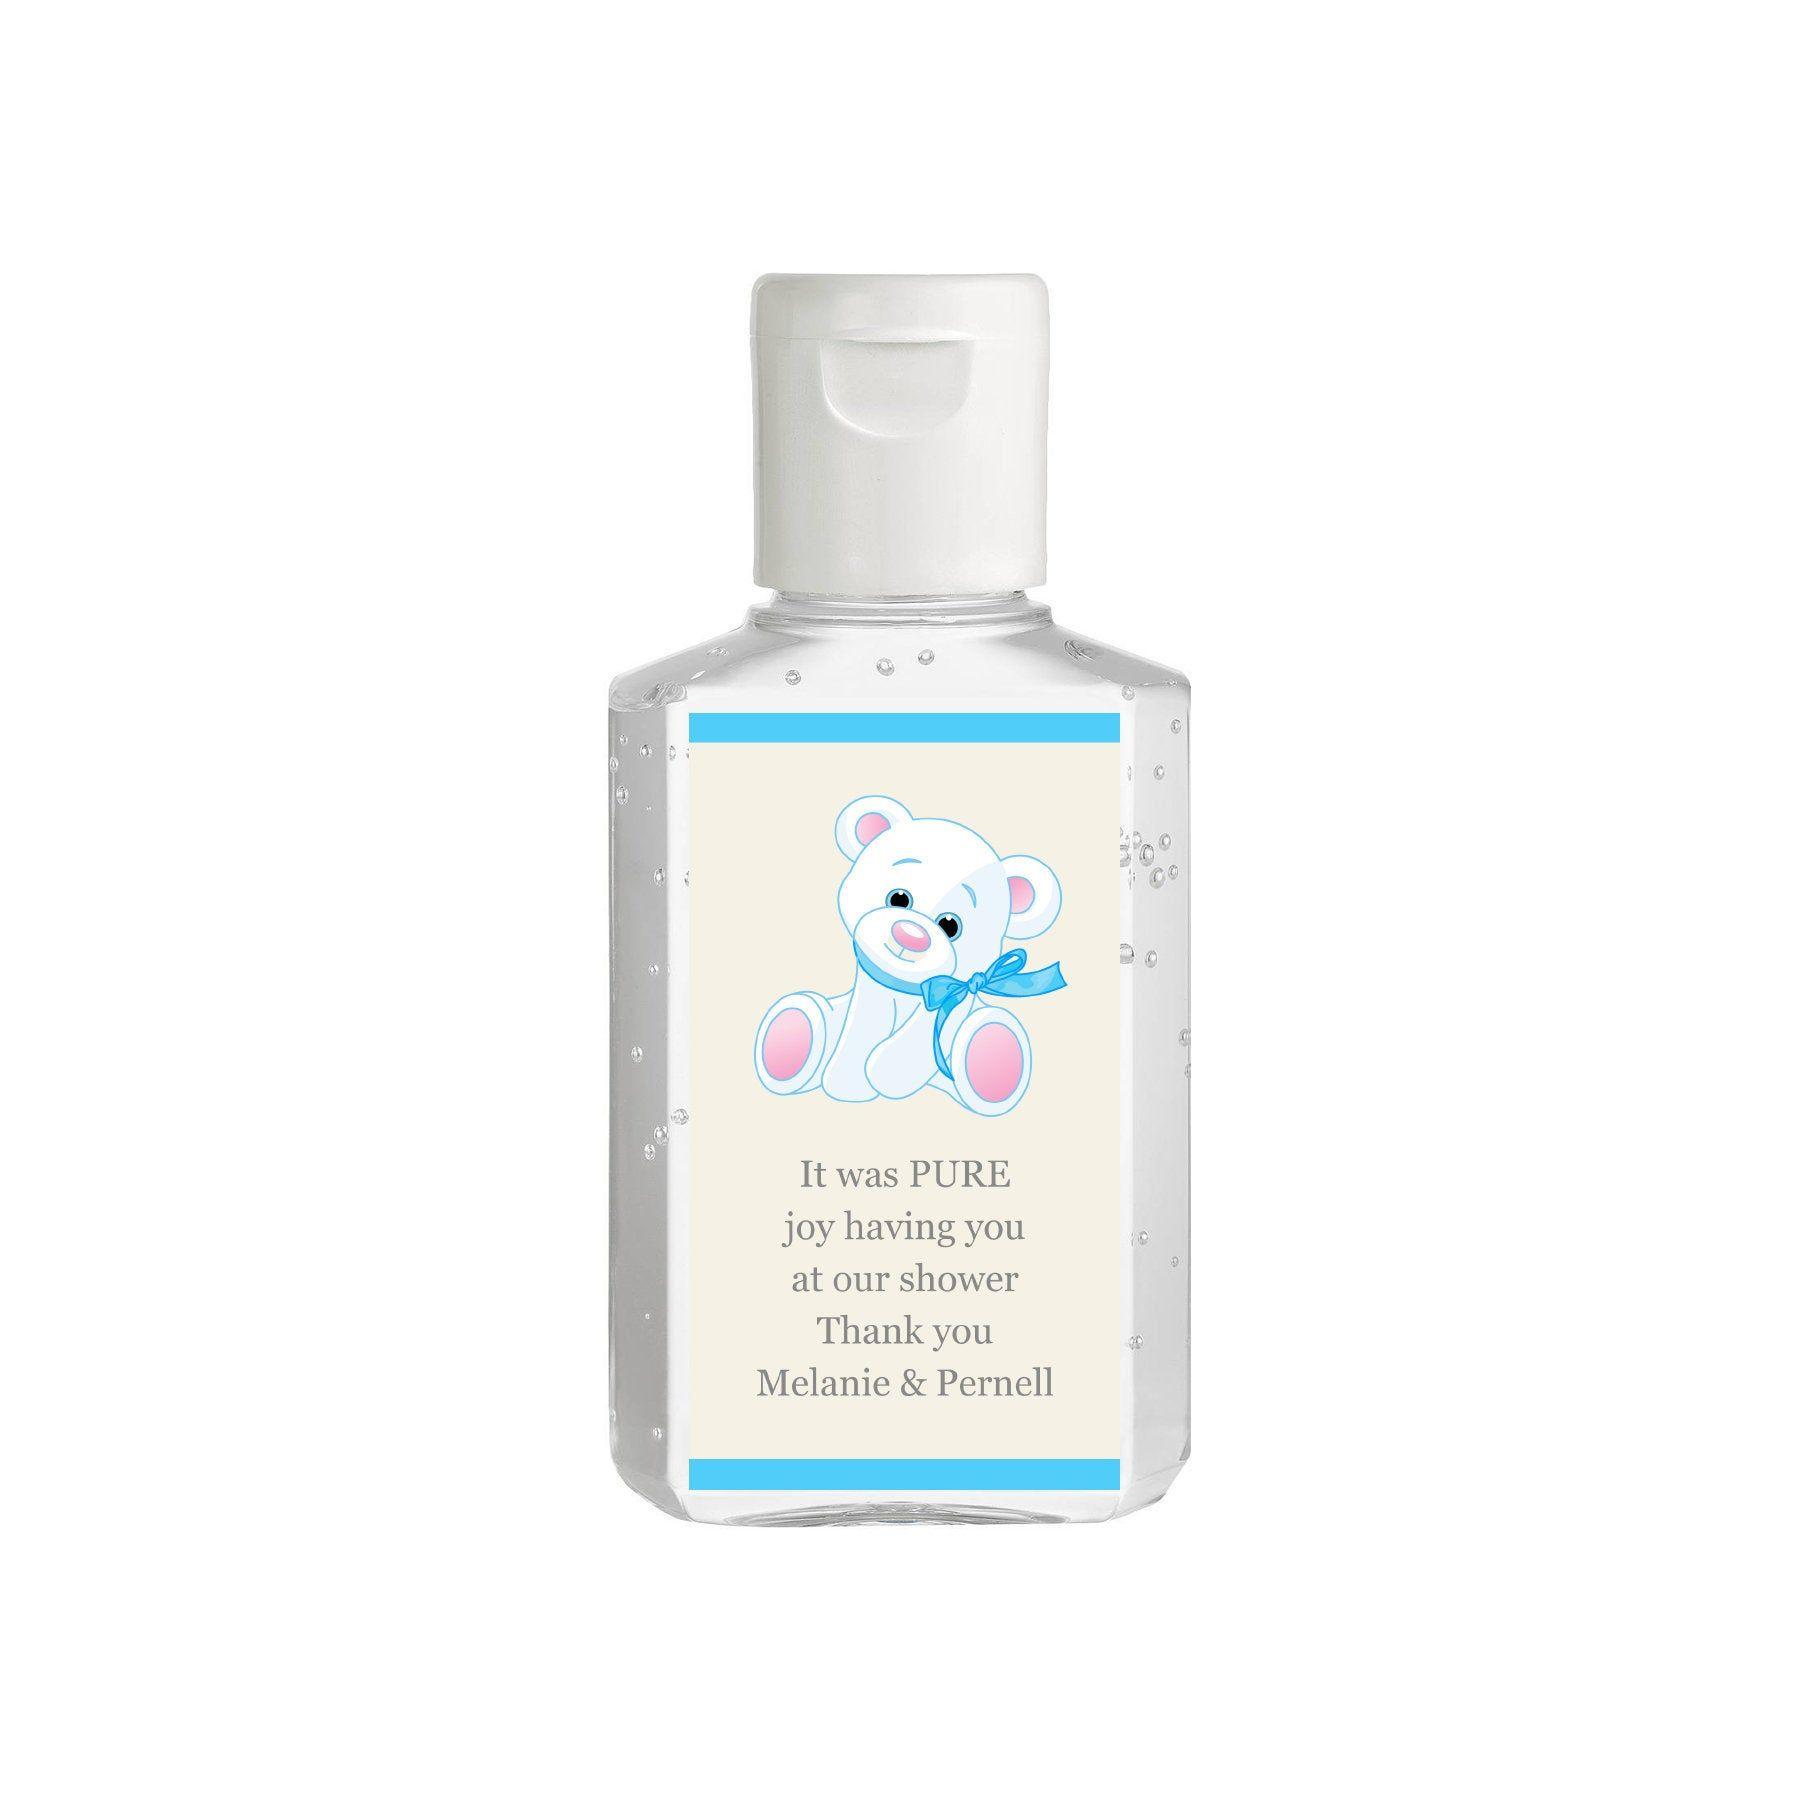 Purell Hand Sanitizer Labels 2 Oz Size Bottle Baby Shower